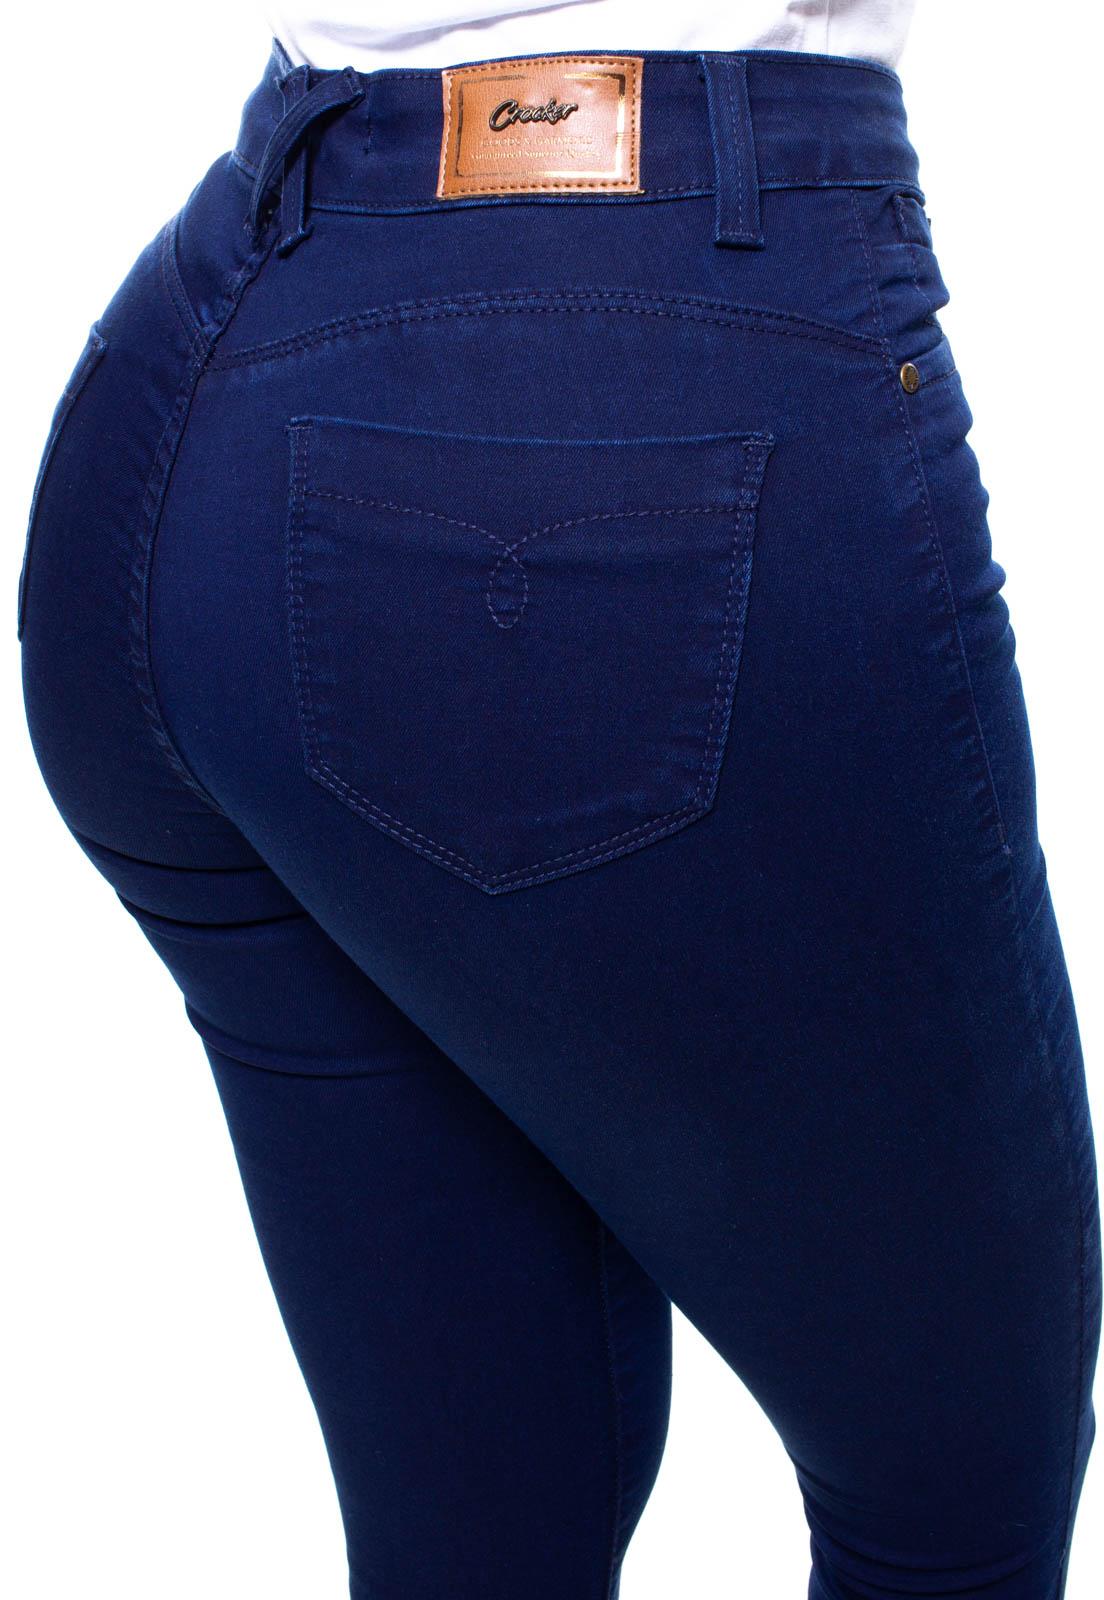 Calça Jeans Skinny Crocker - 48115  - CROCKER JEANS